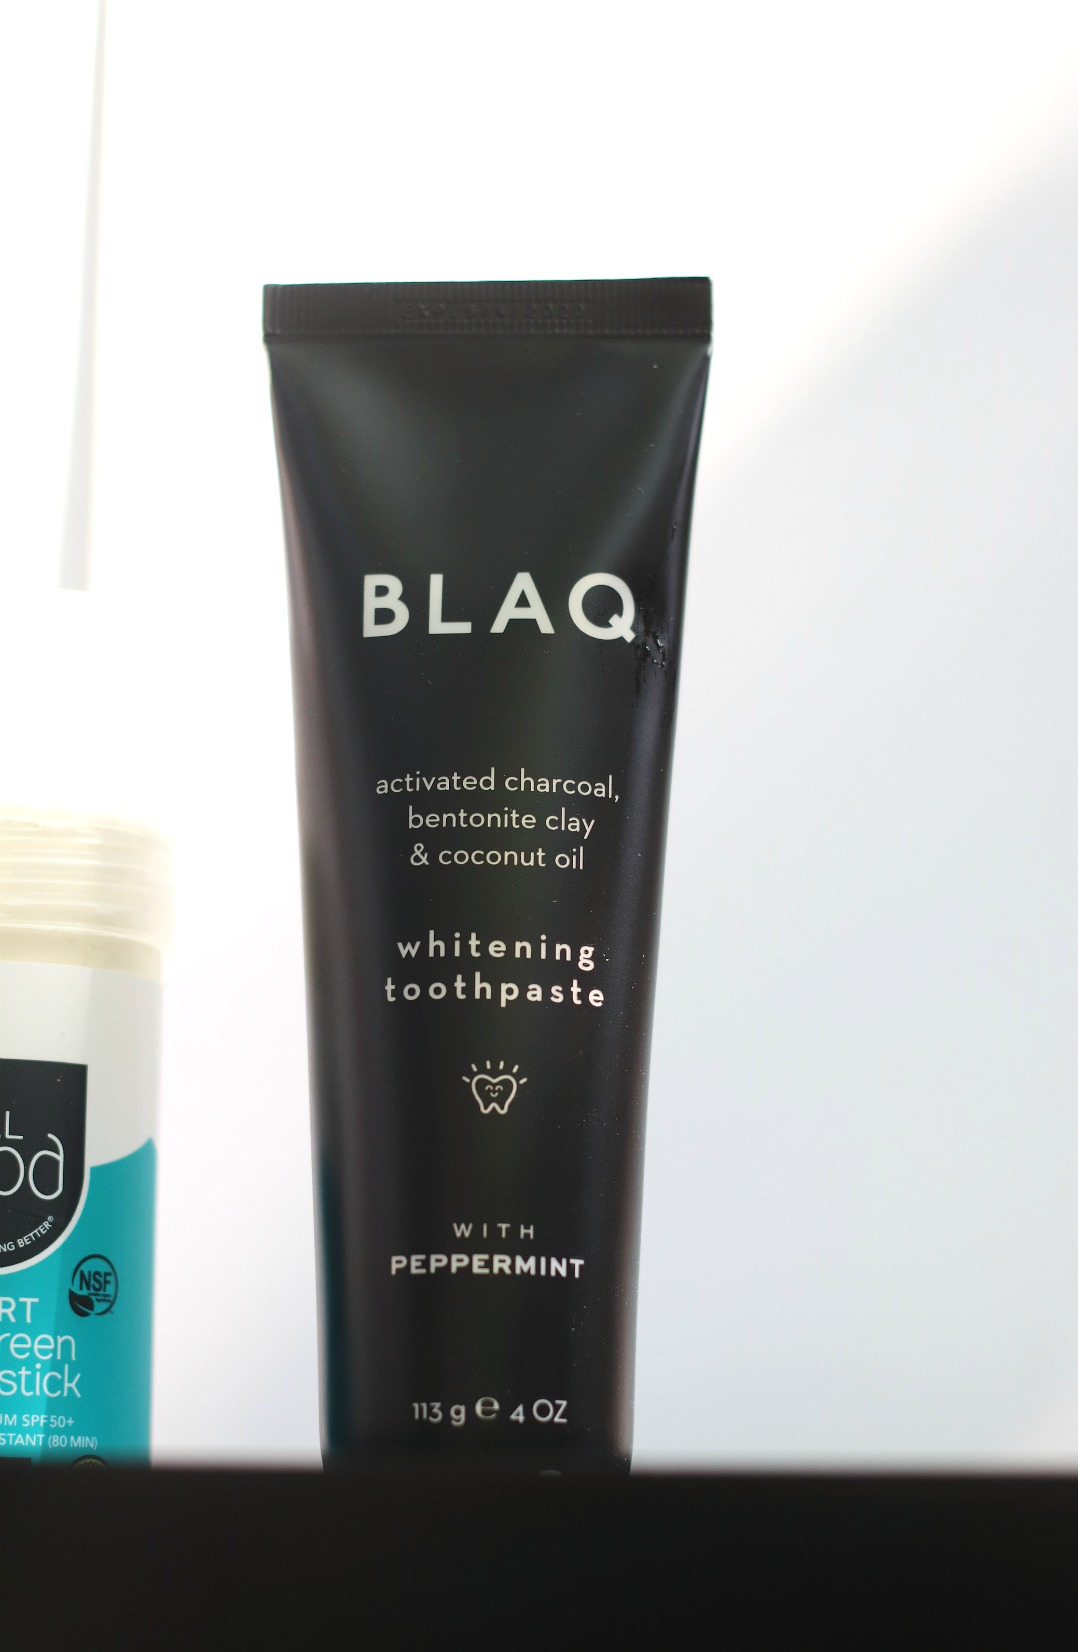 Love Aiki July 2019 BLAQ Whitening Toothpaste in tube